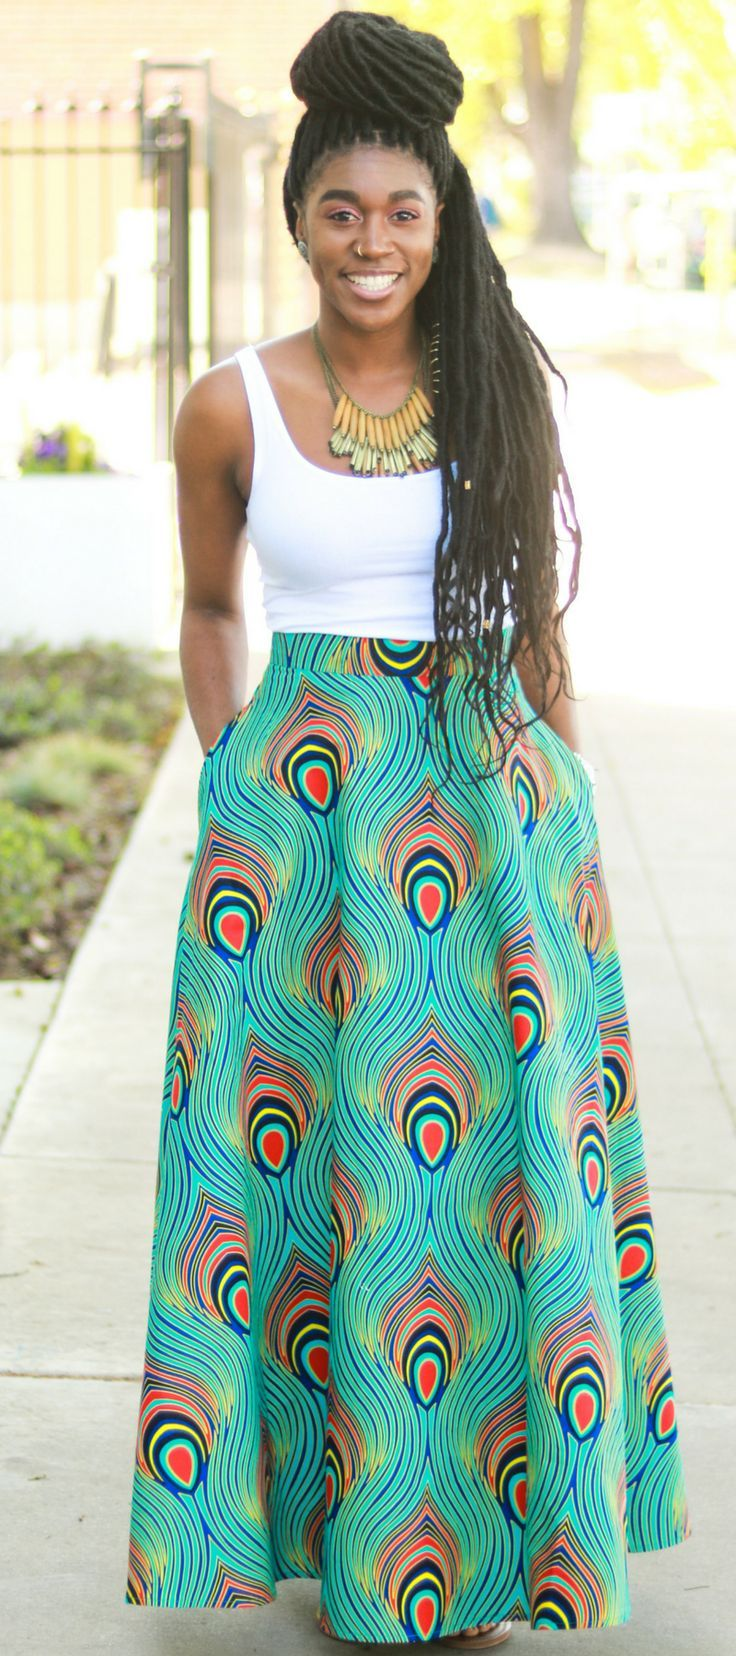 Diy Half Circle Skirt With Pockets Tutorial Montoya Mayo African Print Skirt Midi Circle Skirt African Clothing